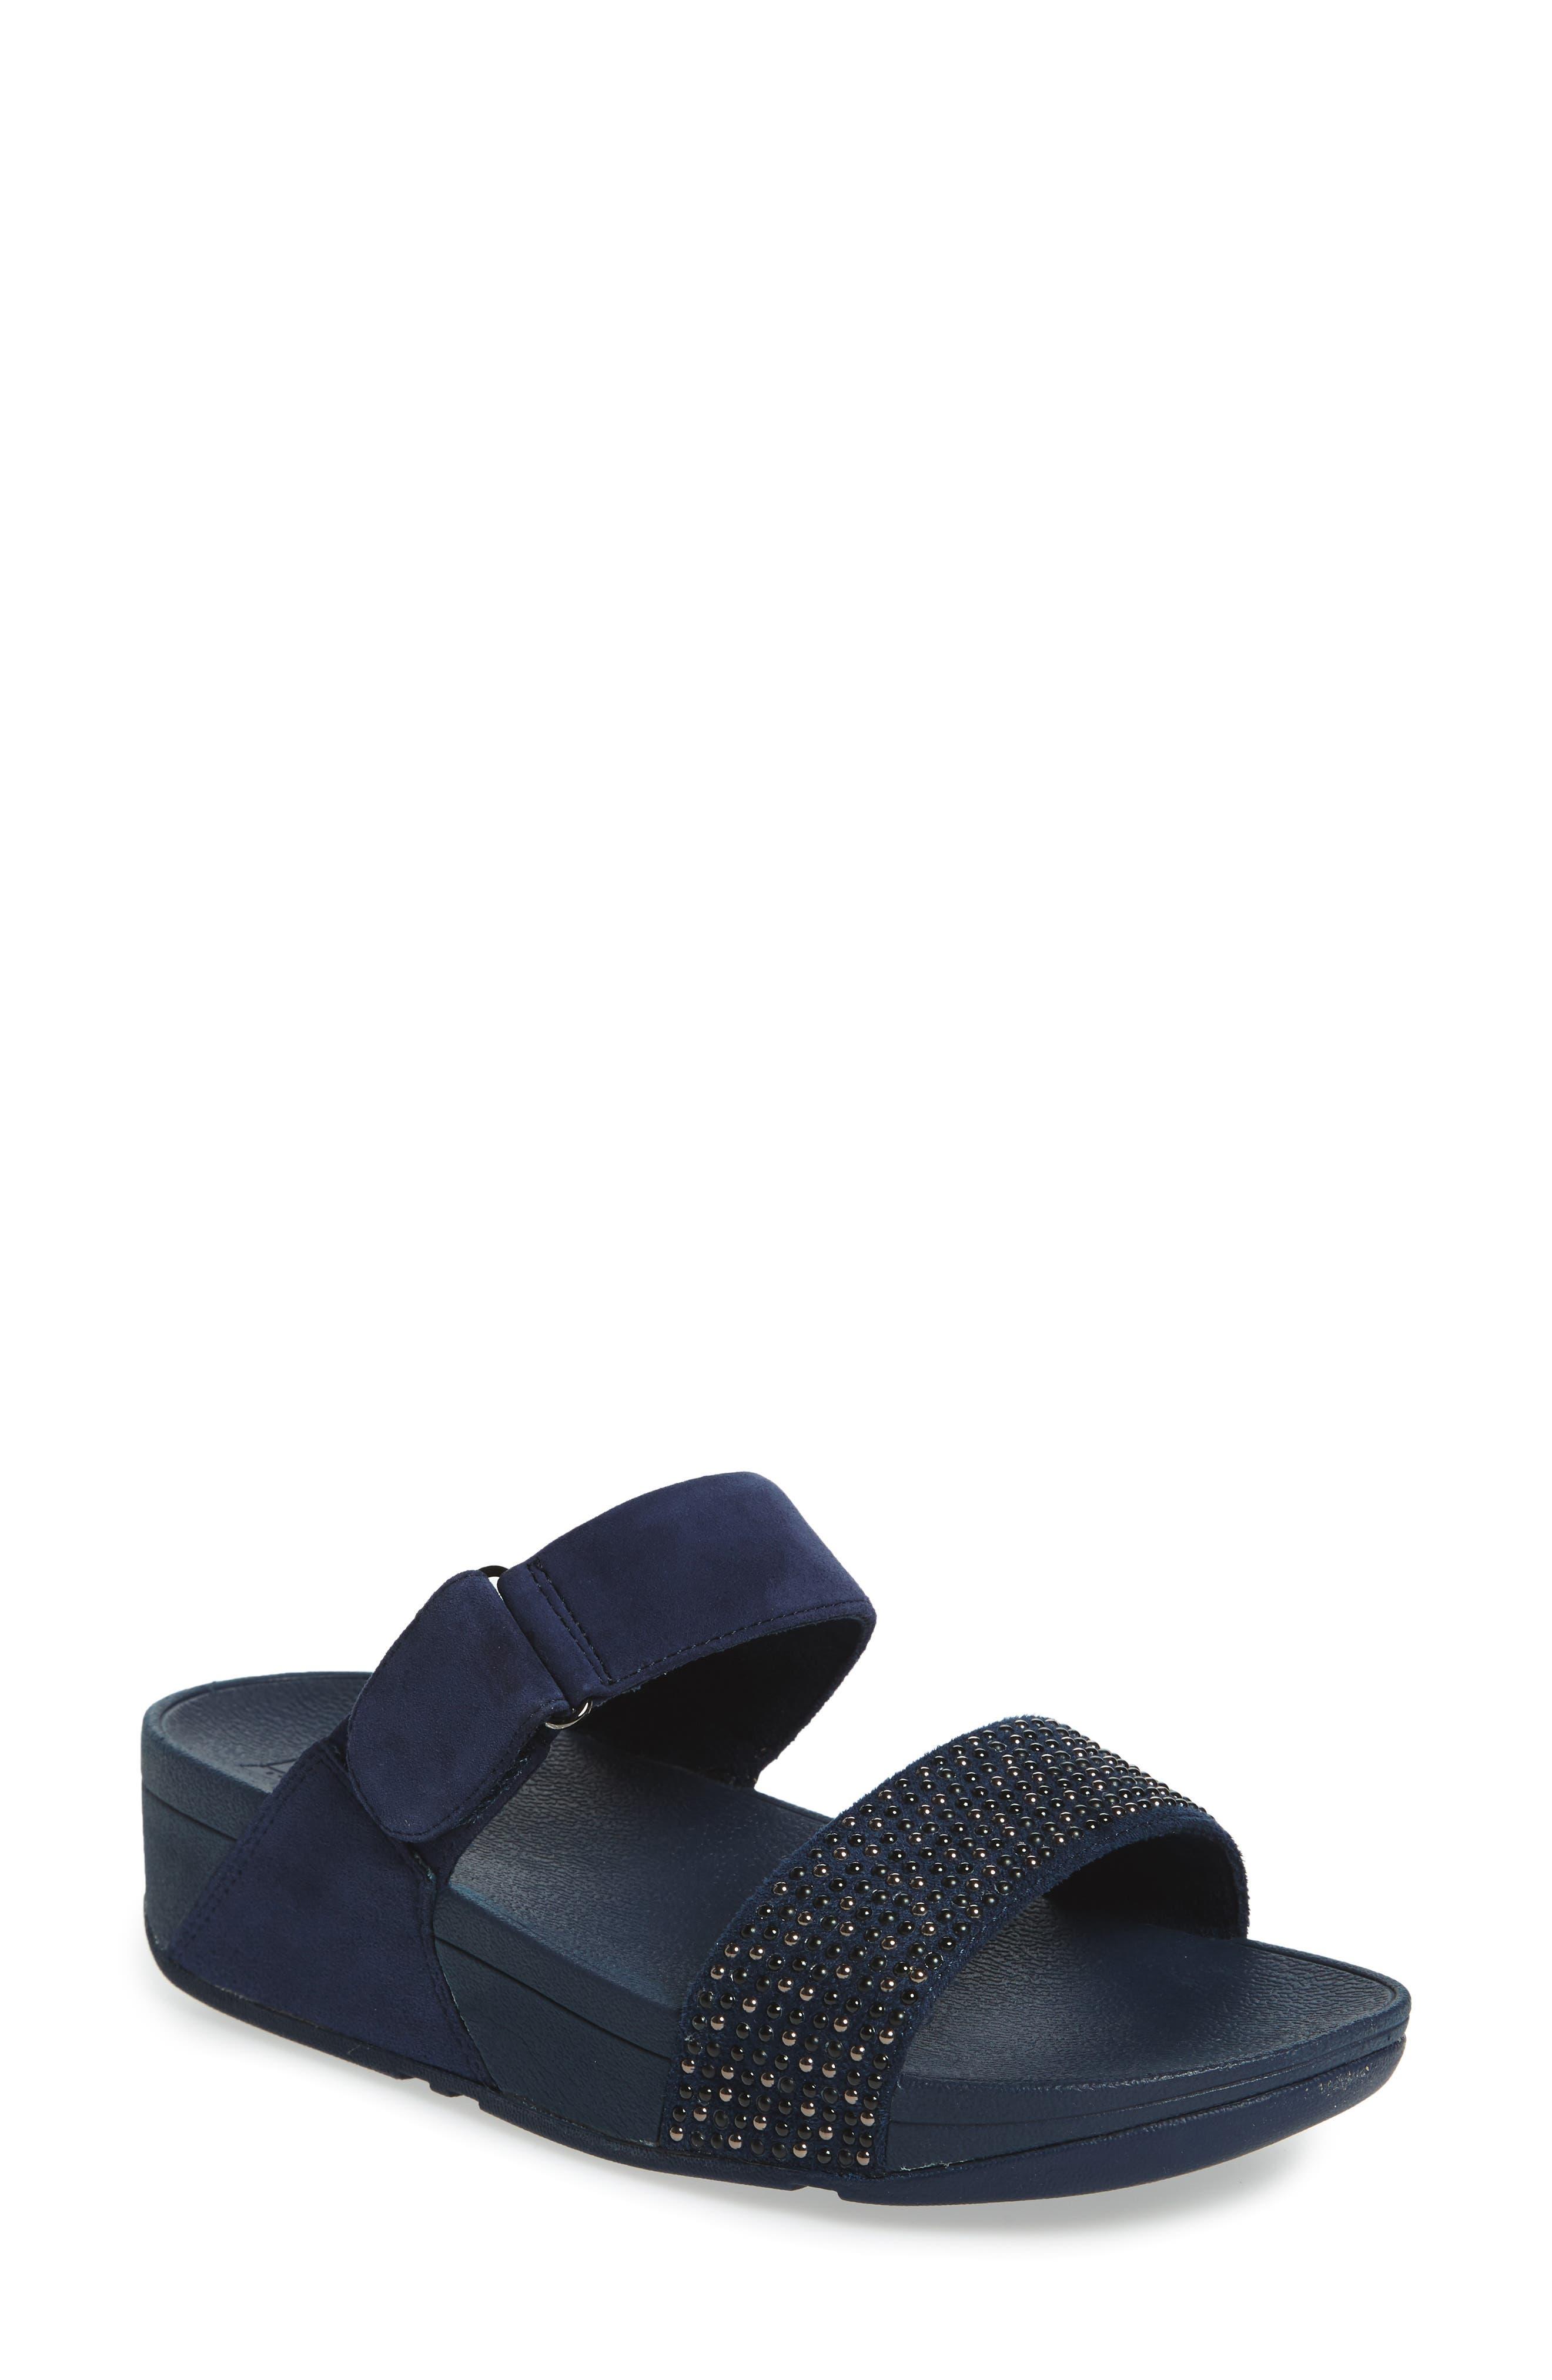 Alternate Image 1 Selected - FitFlop Lulu Popstud Wedge Slide Sandal (Women)